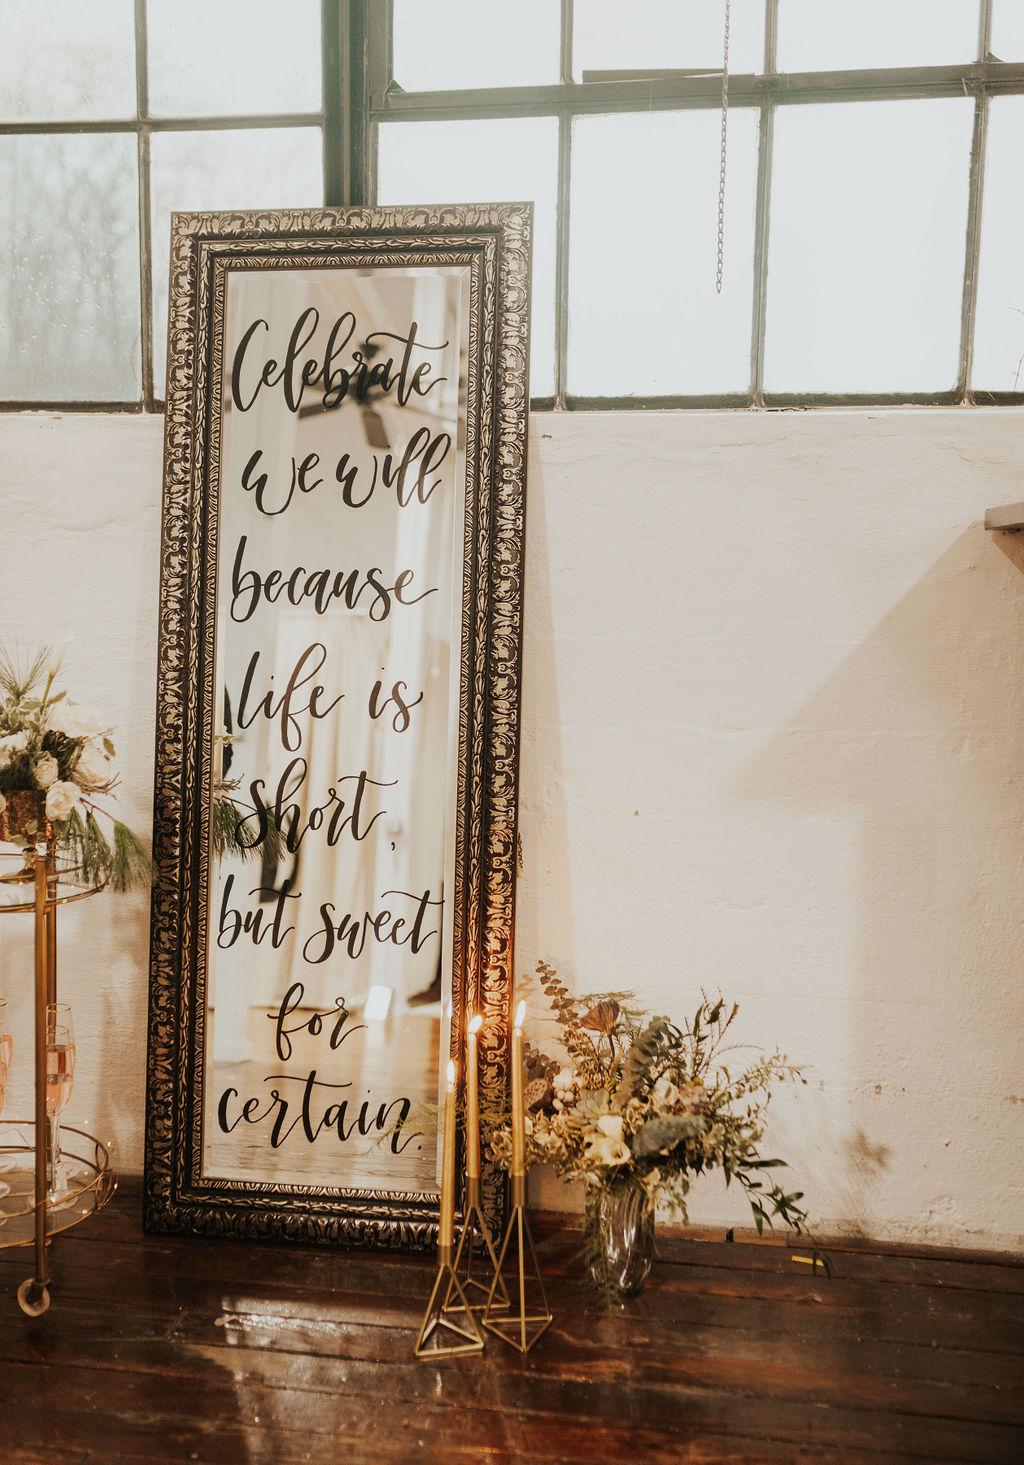 Intimate Black and Gold WInter Wedding Vegan